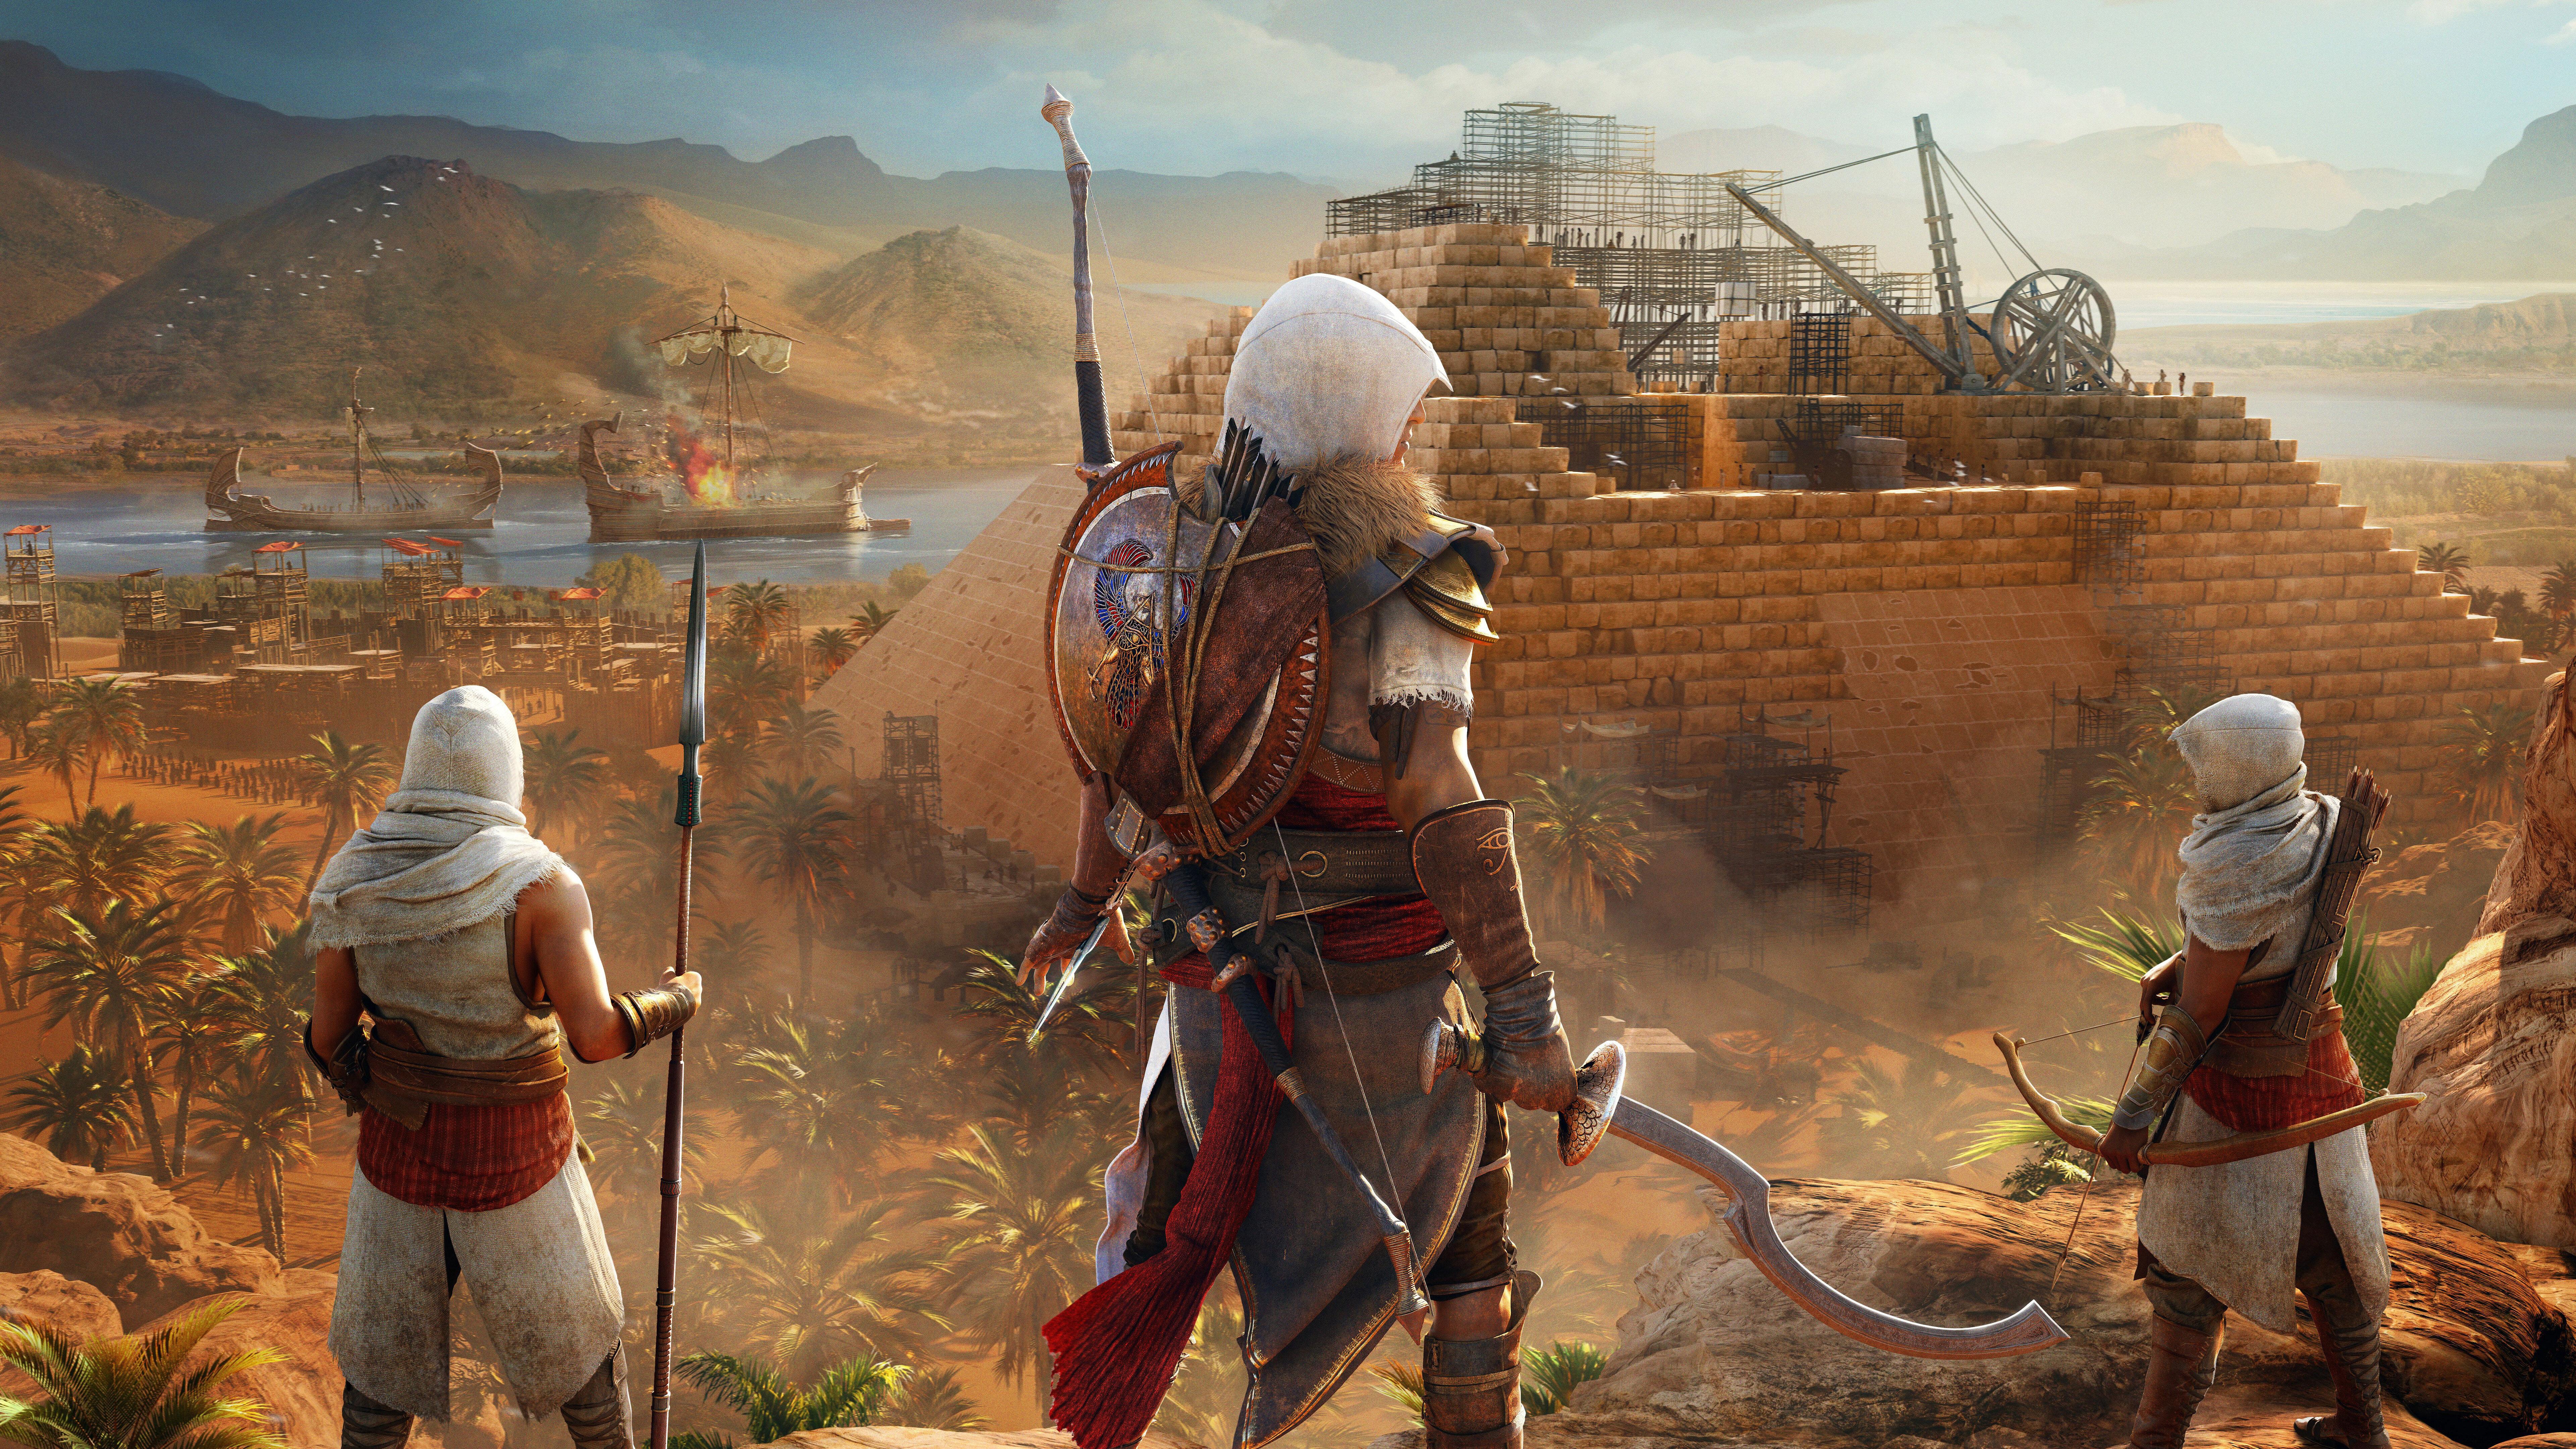 7680x4320 8k Assassins Creed Origins 8k Hd 4k Wallpapers Images